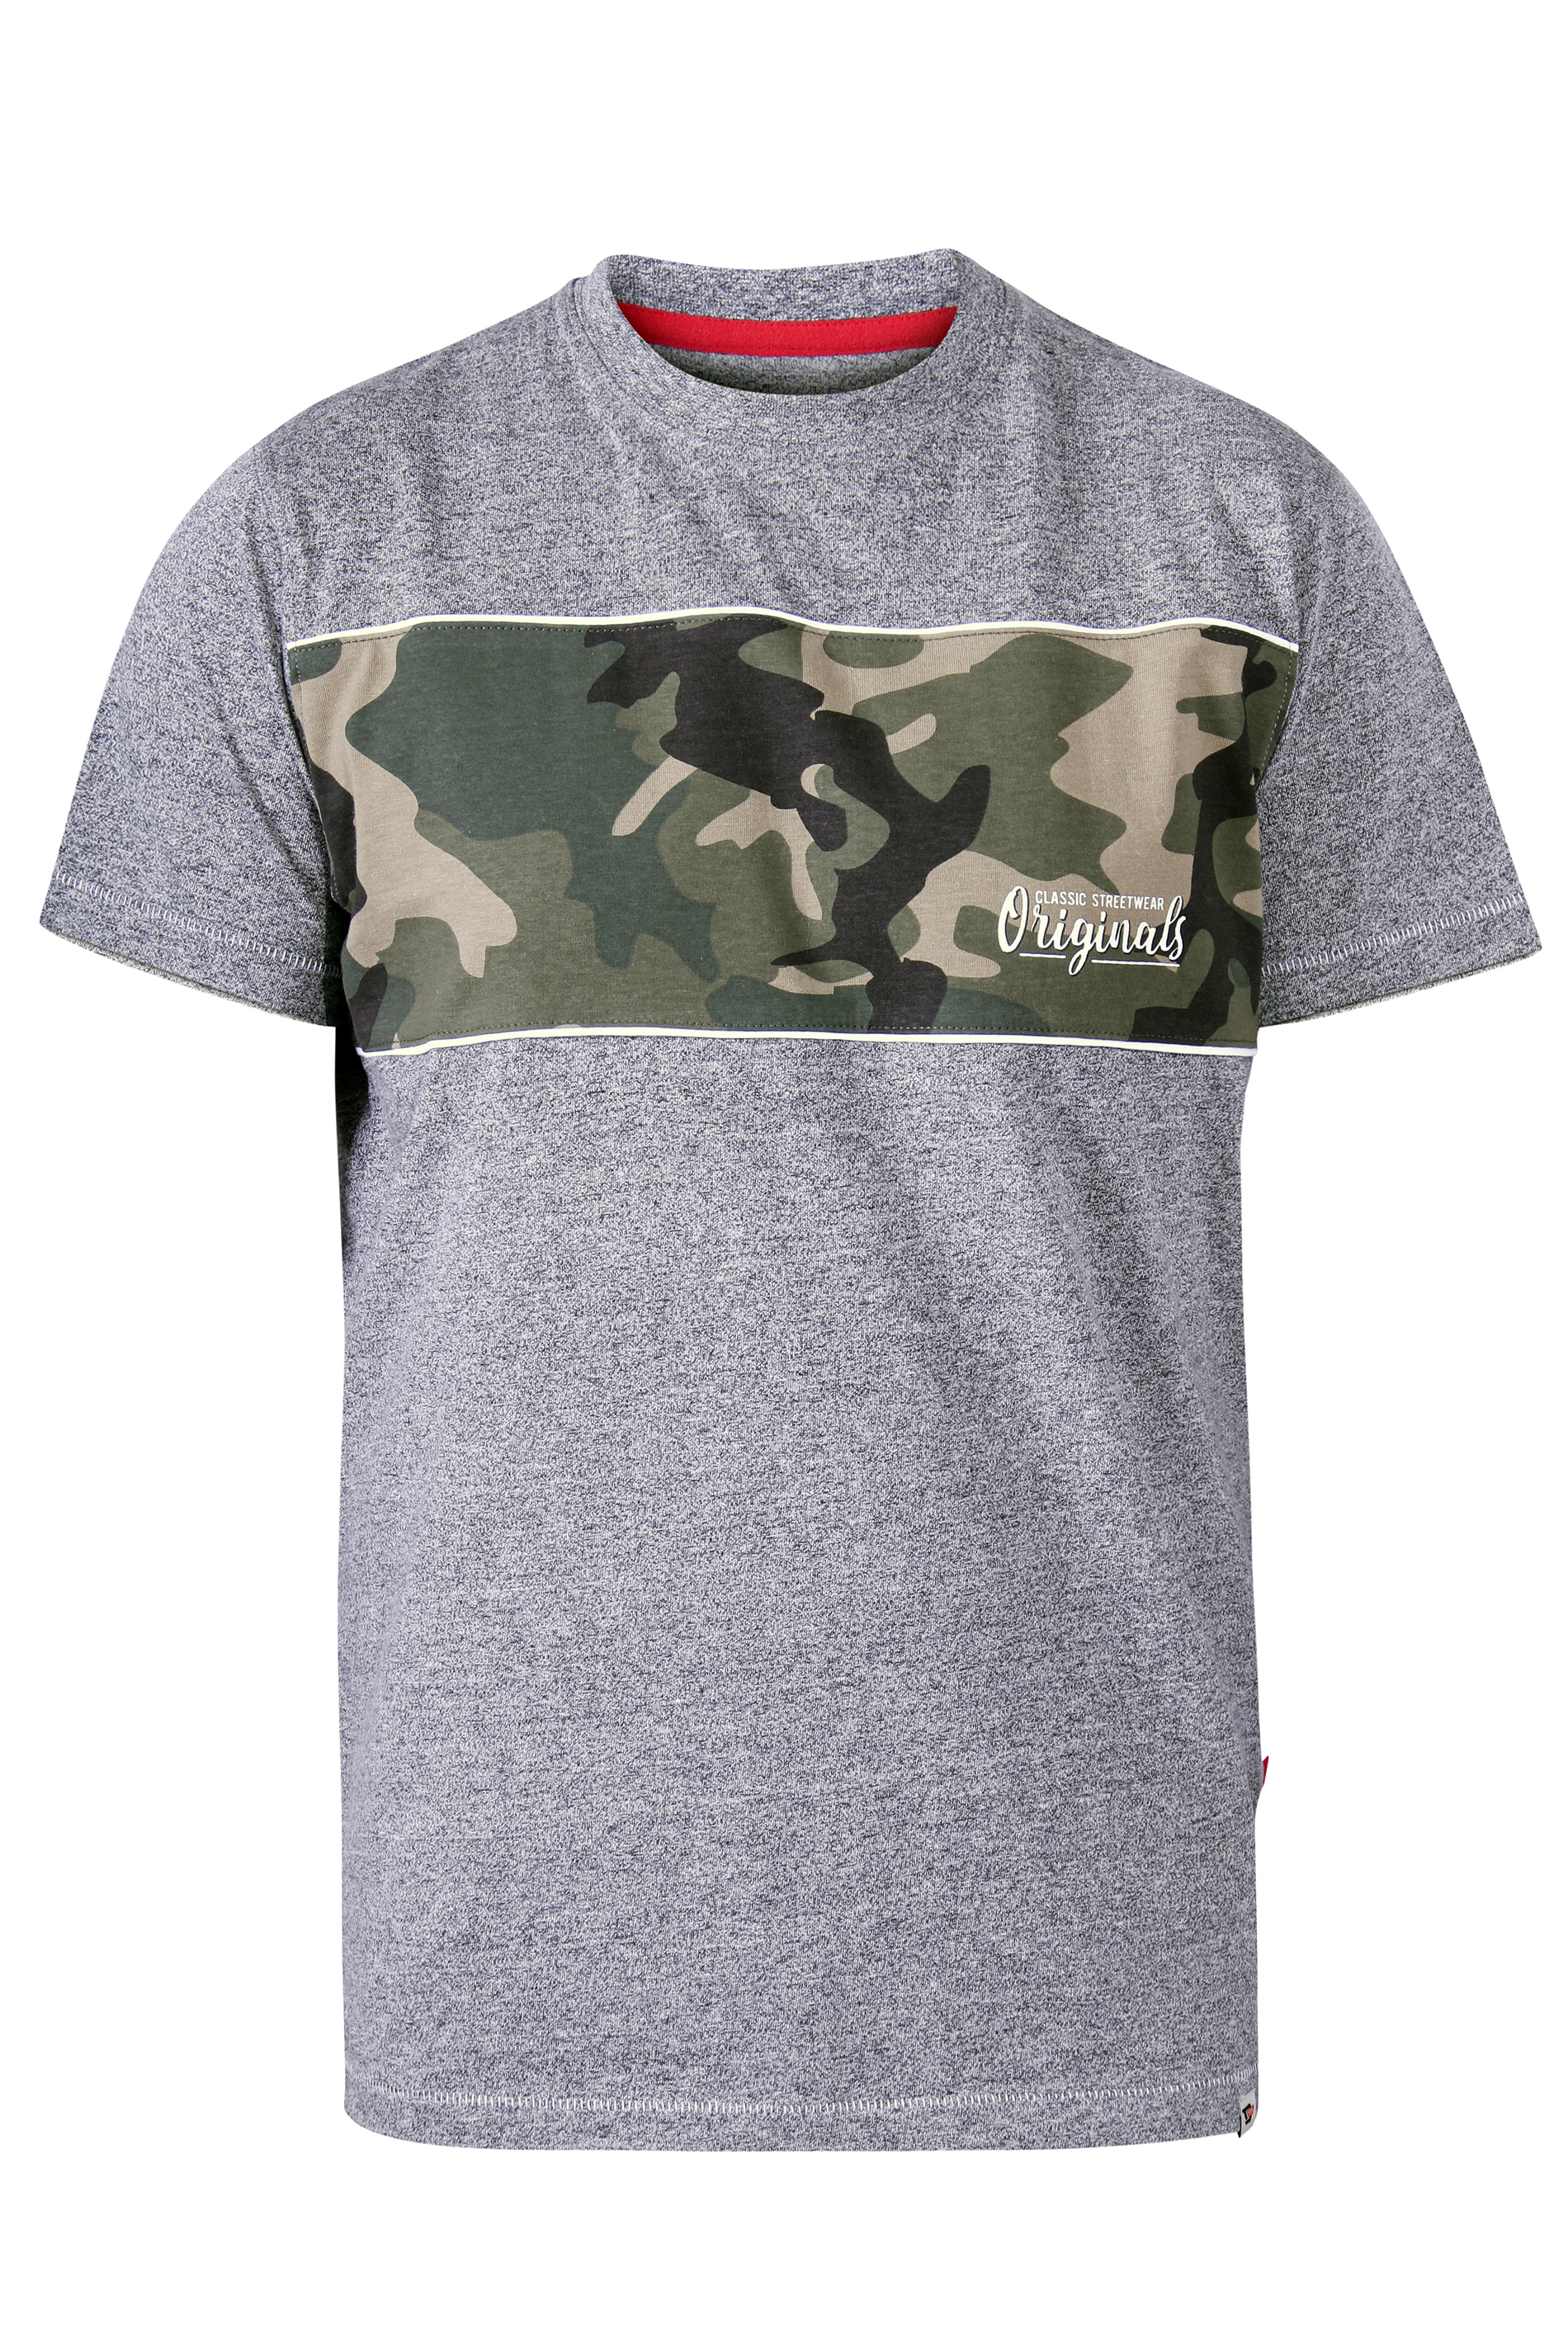 D555 Grey Camo Printed Graphic T-Shirt